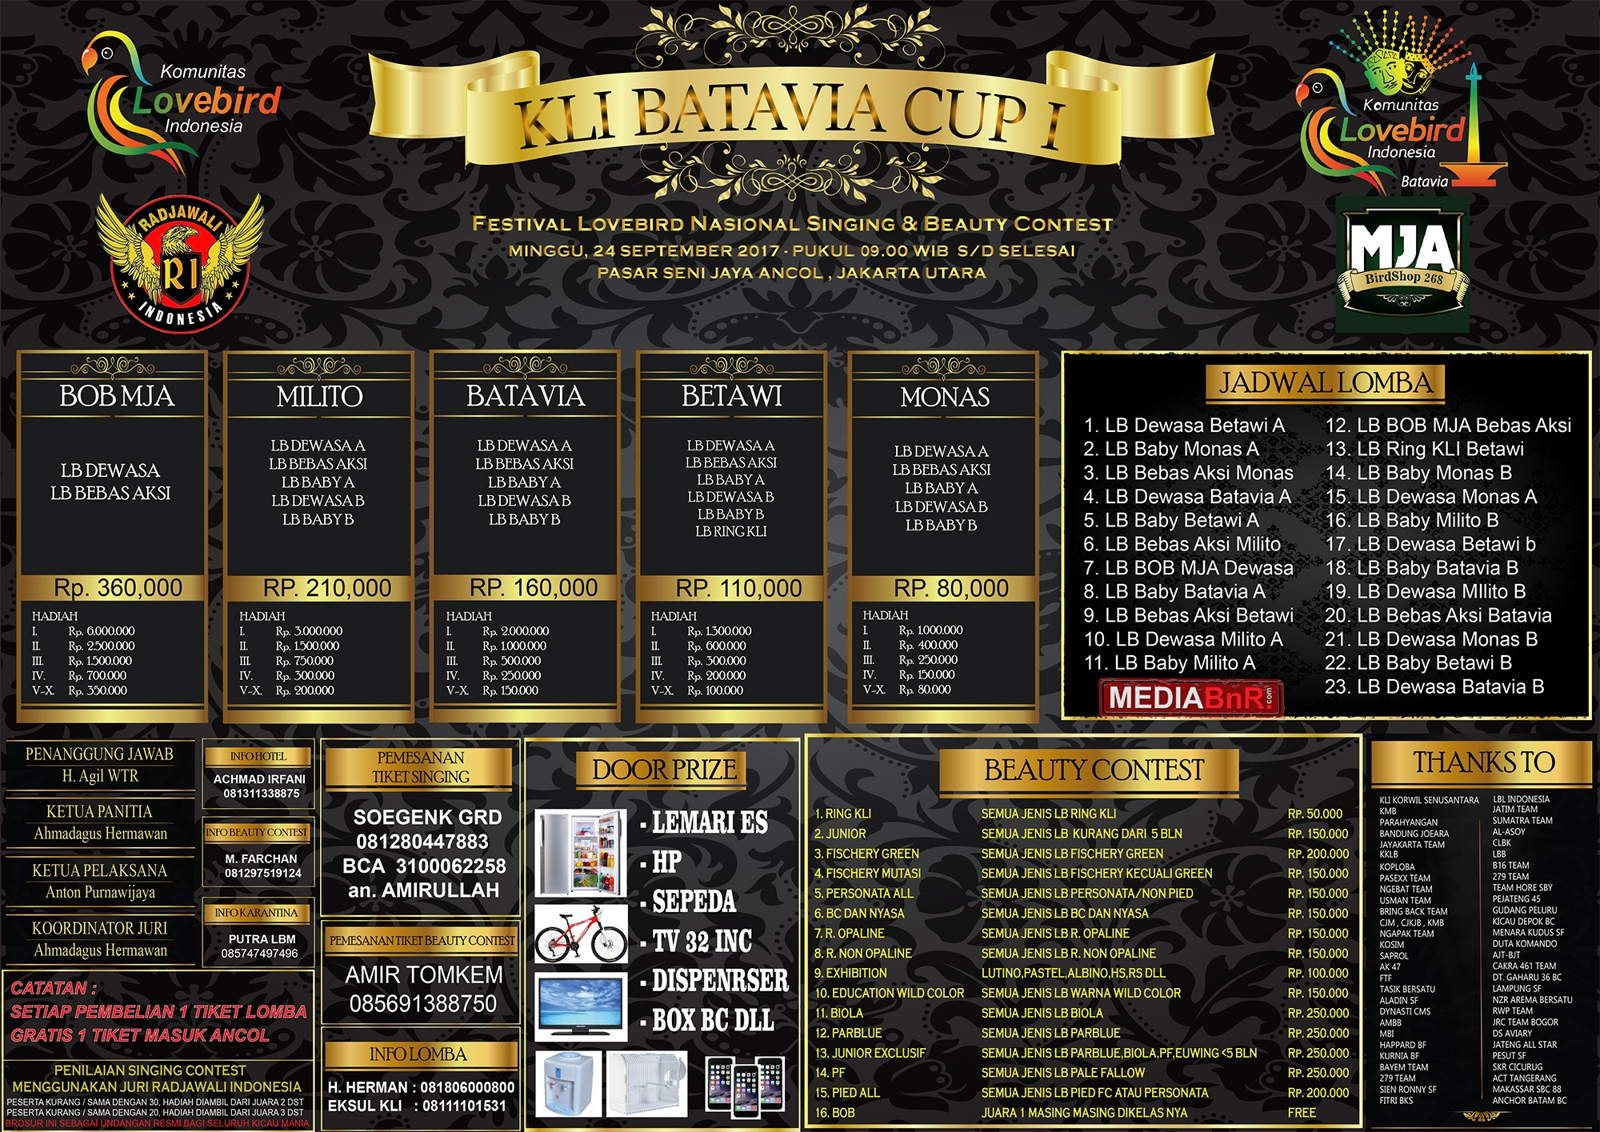 BROSUR KLI BATAVIA CUP 1 RGB